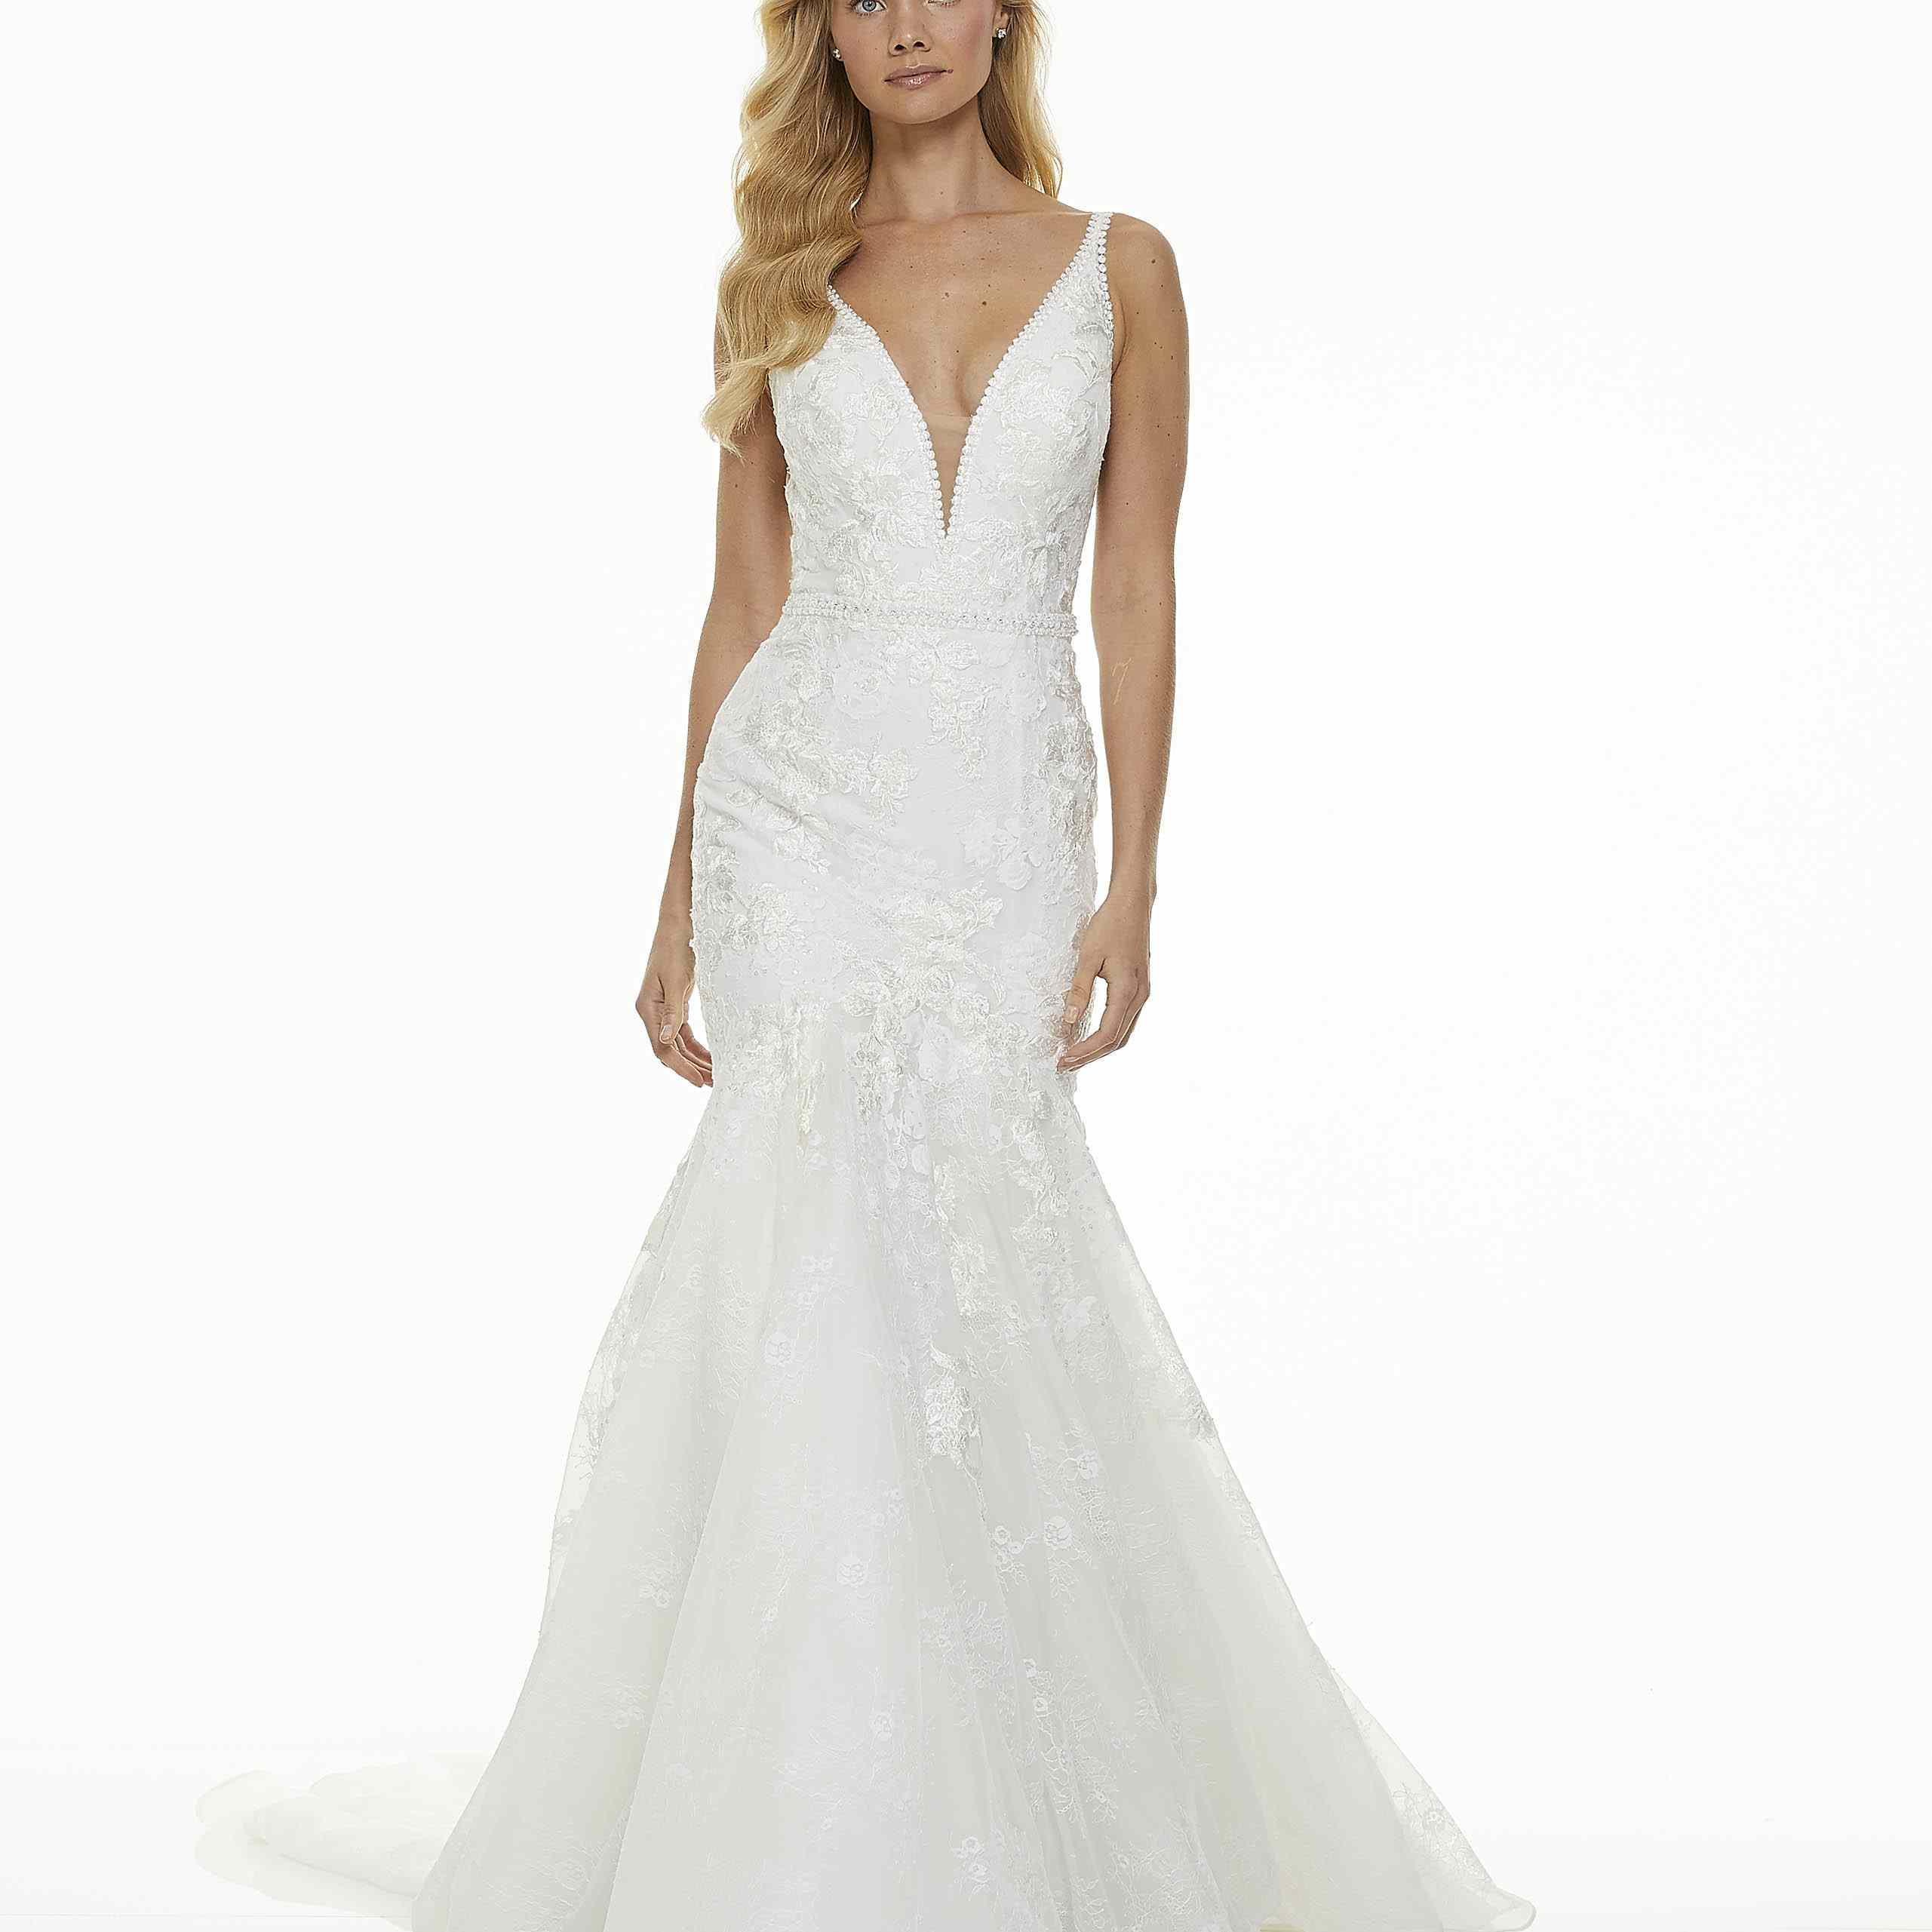 Model in mermaid wedding dress with plunging neckline